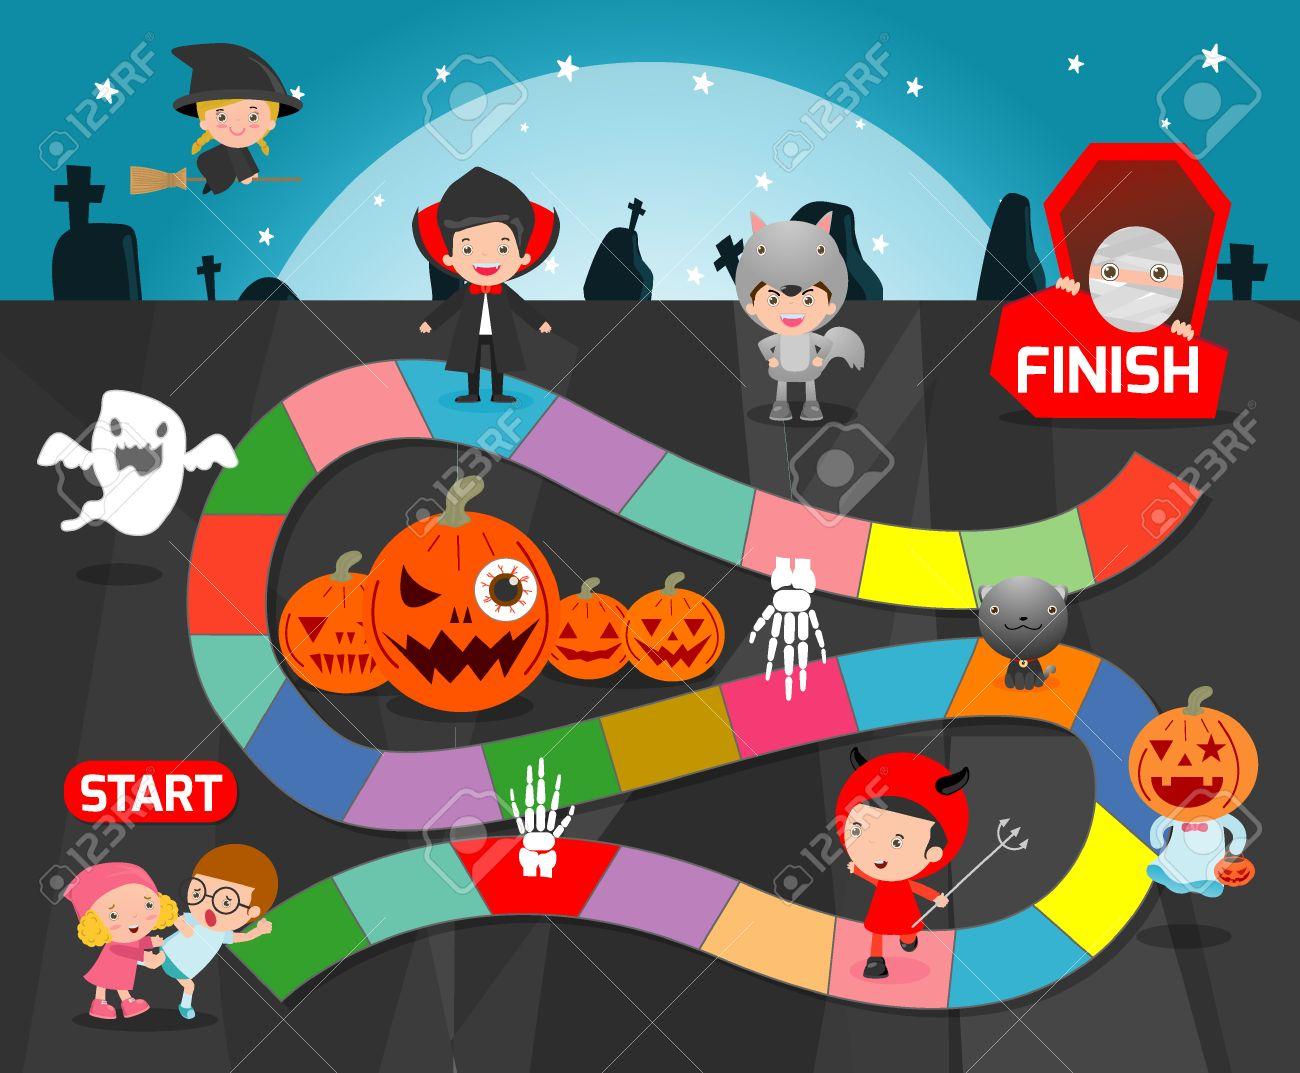 brettspiel mit halloween spiele fur kinder kinderbrettspiel illustration standard bild 63046906